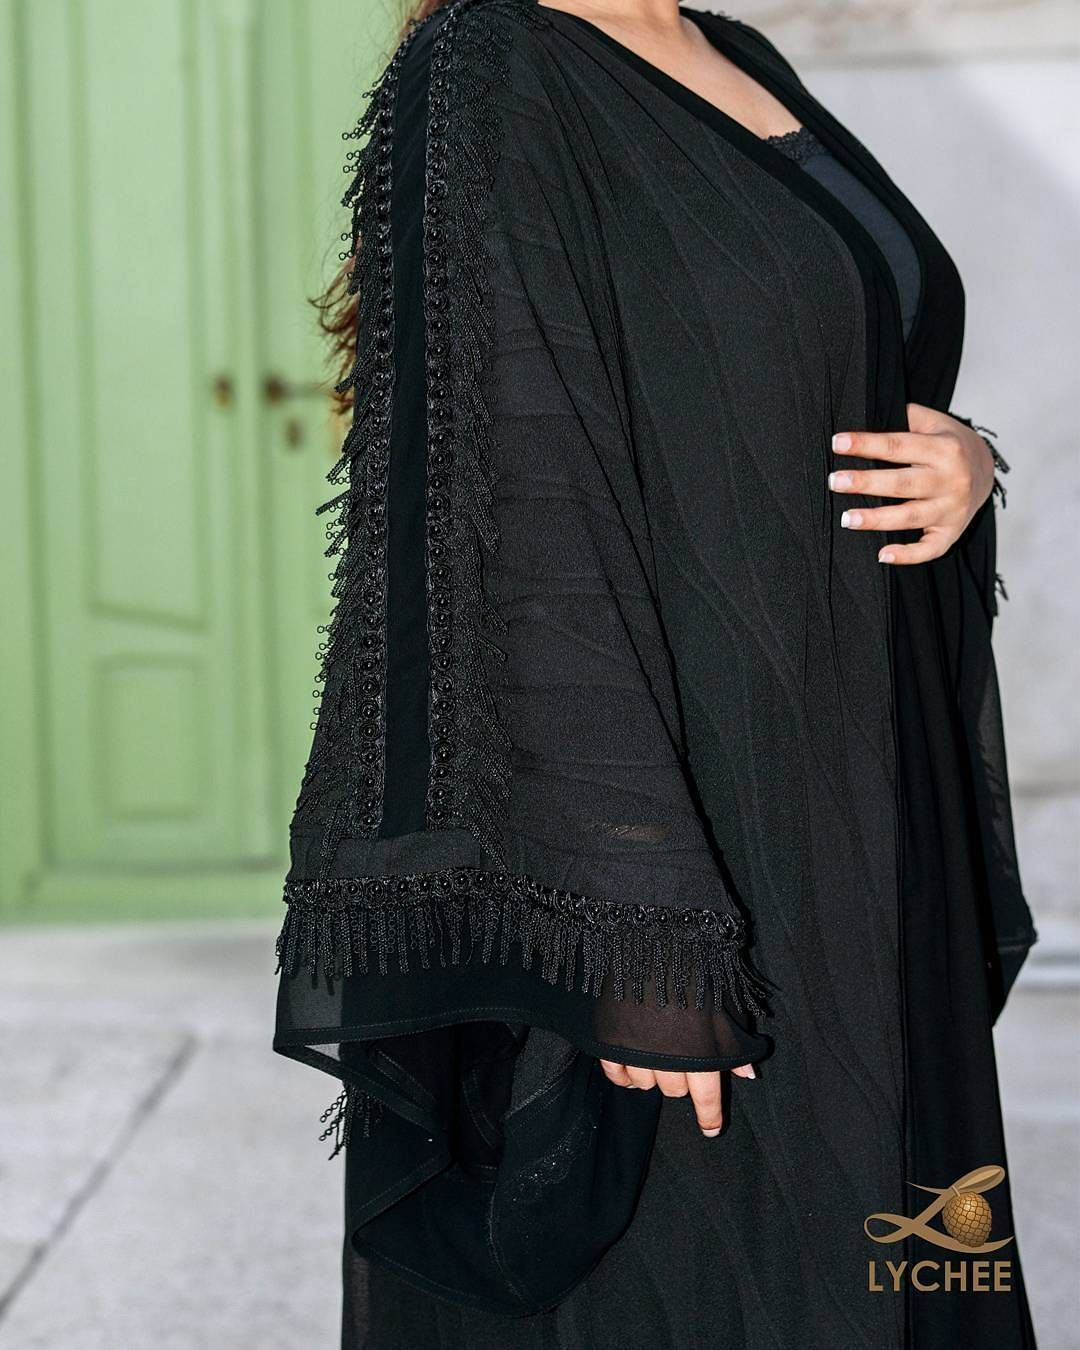 Repost Lychee Bh With Instatoolsapp تفاضيل اكثر للعباية في البوست السابق القماش سترج مع تفاصيل والدانتيل بالاطراف والك Abaya Fashion Fashion Outfits Fashion